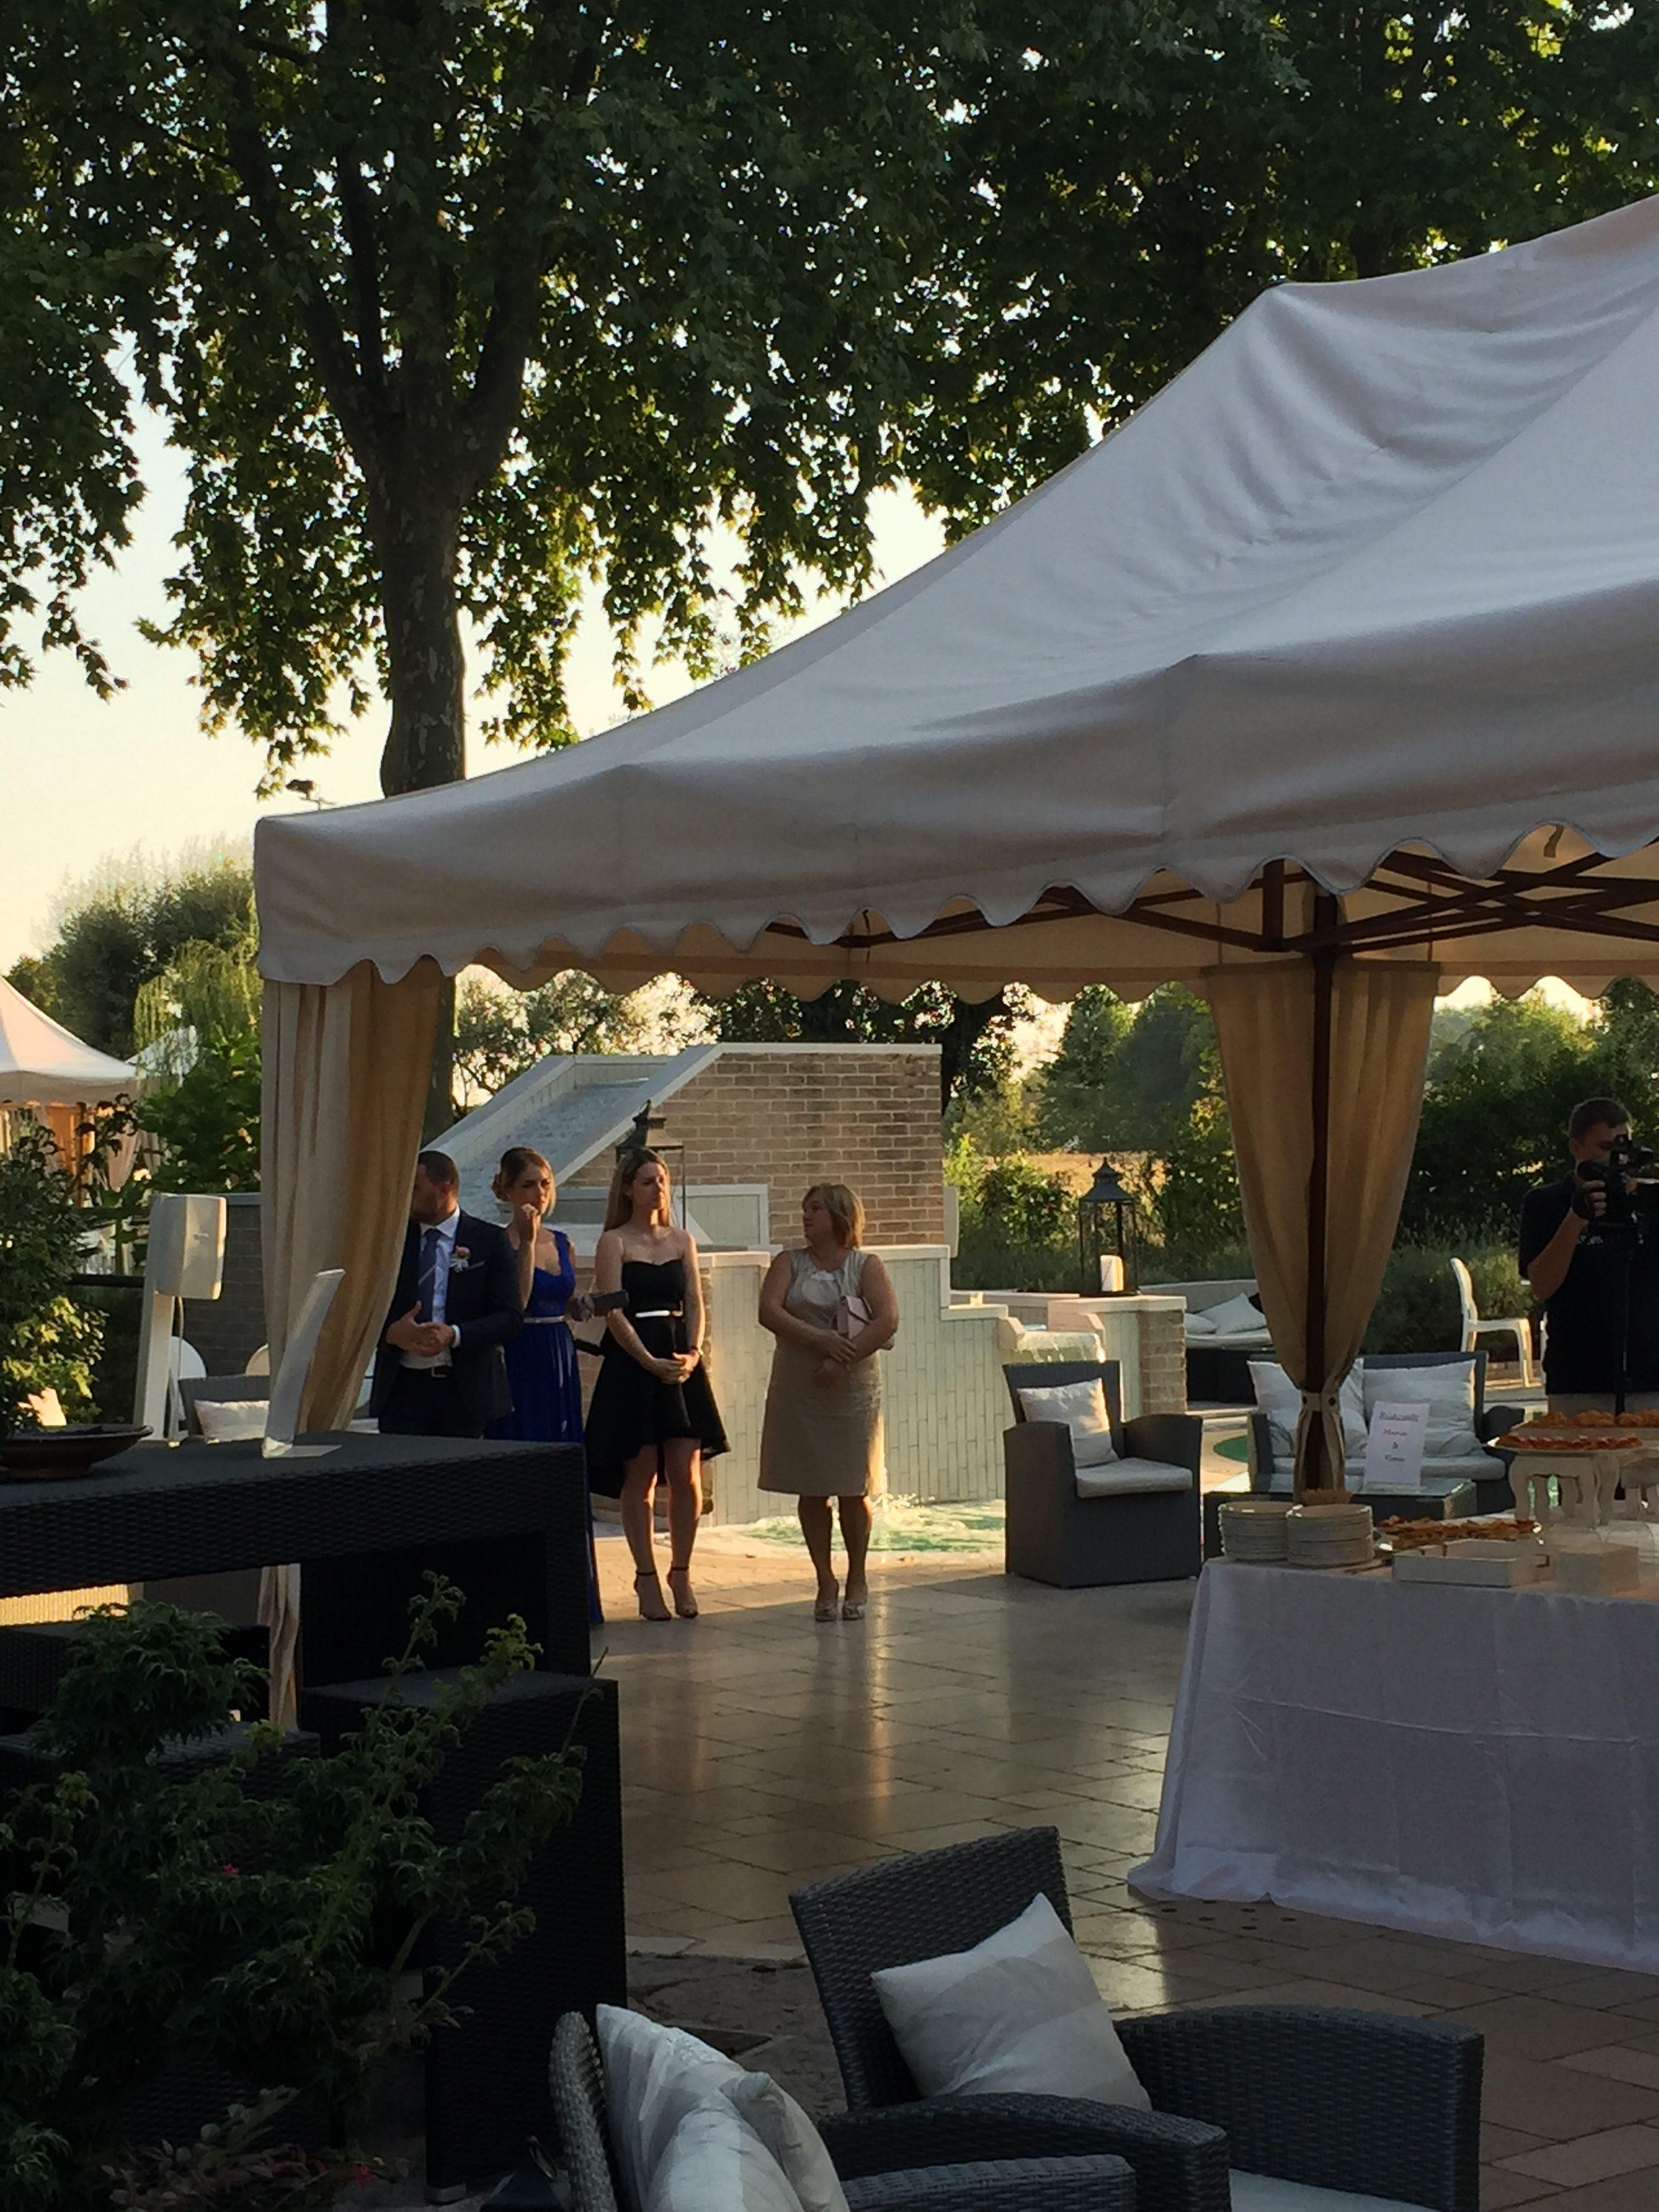 giardino estivo per matrimoni e cerimonie